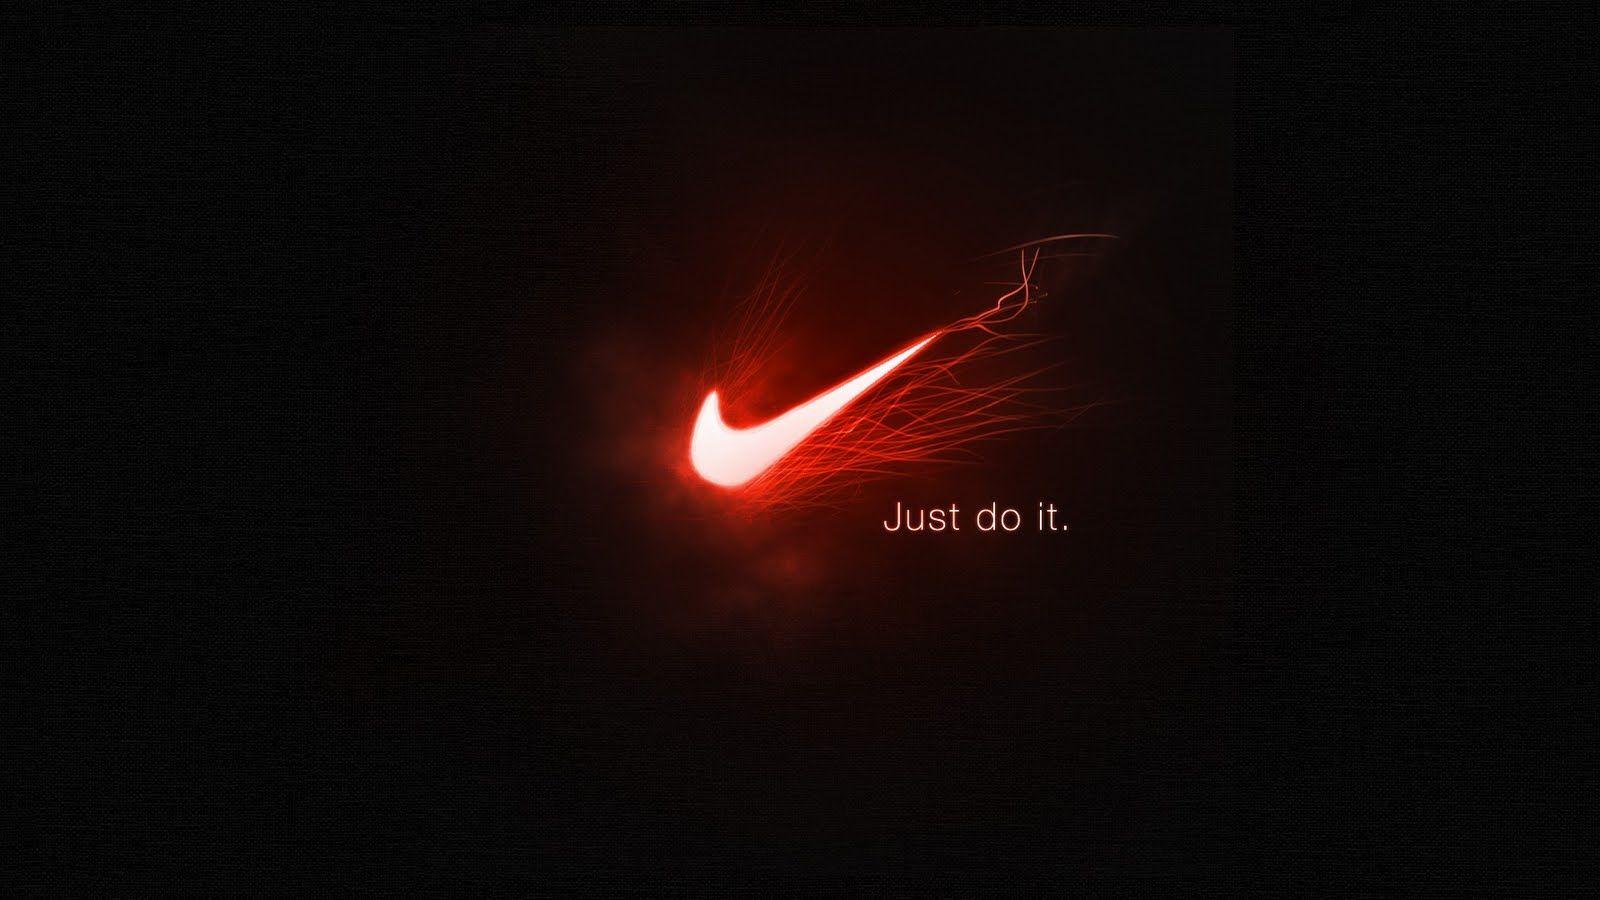 nike symbol Google Search Nike wallpaper, Nike logo